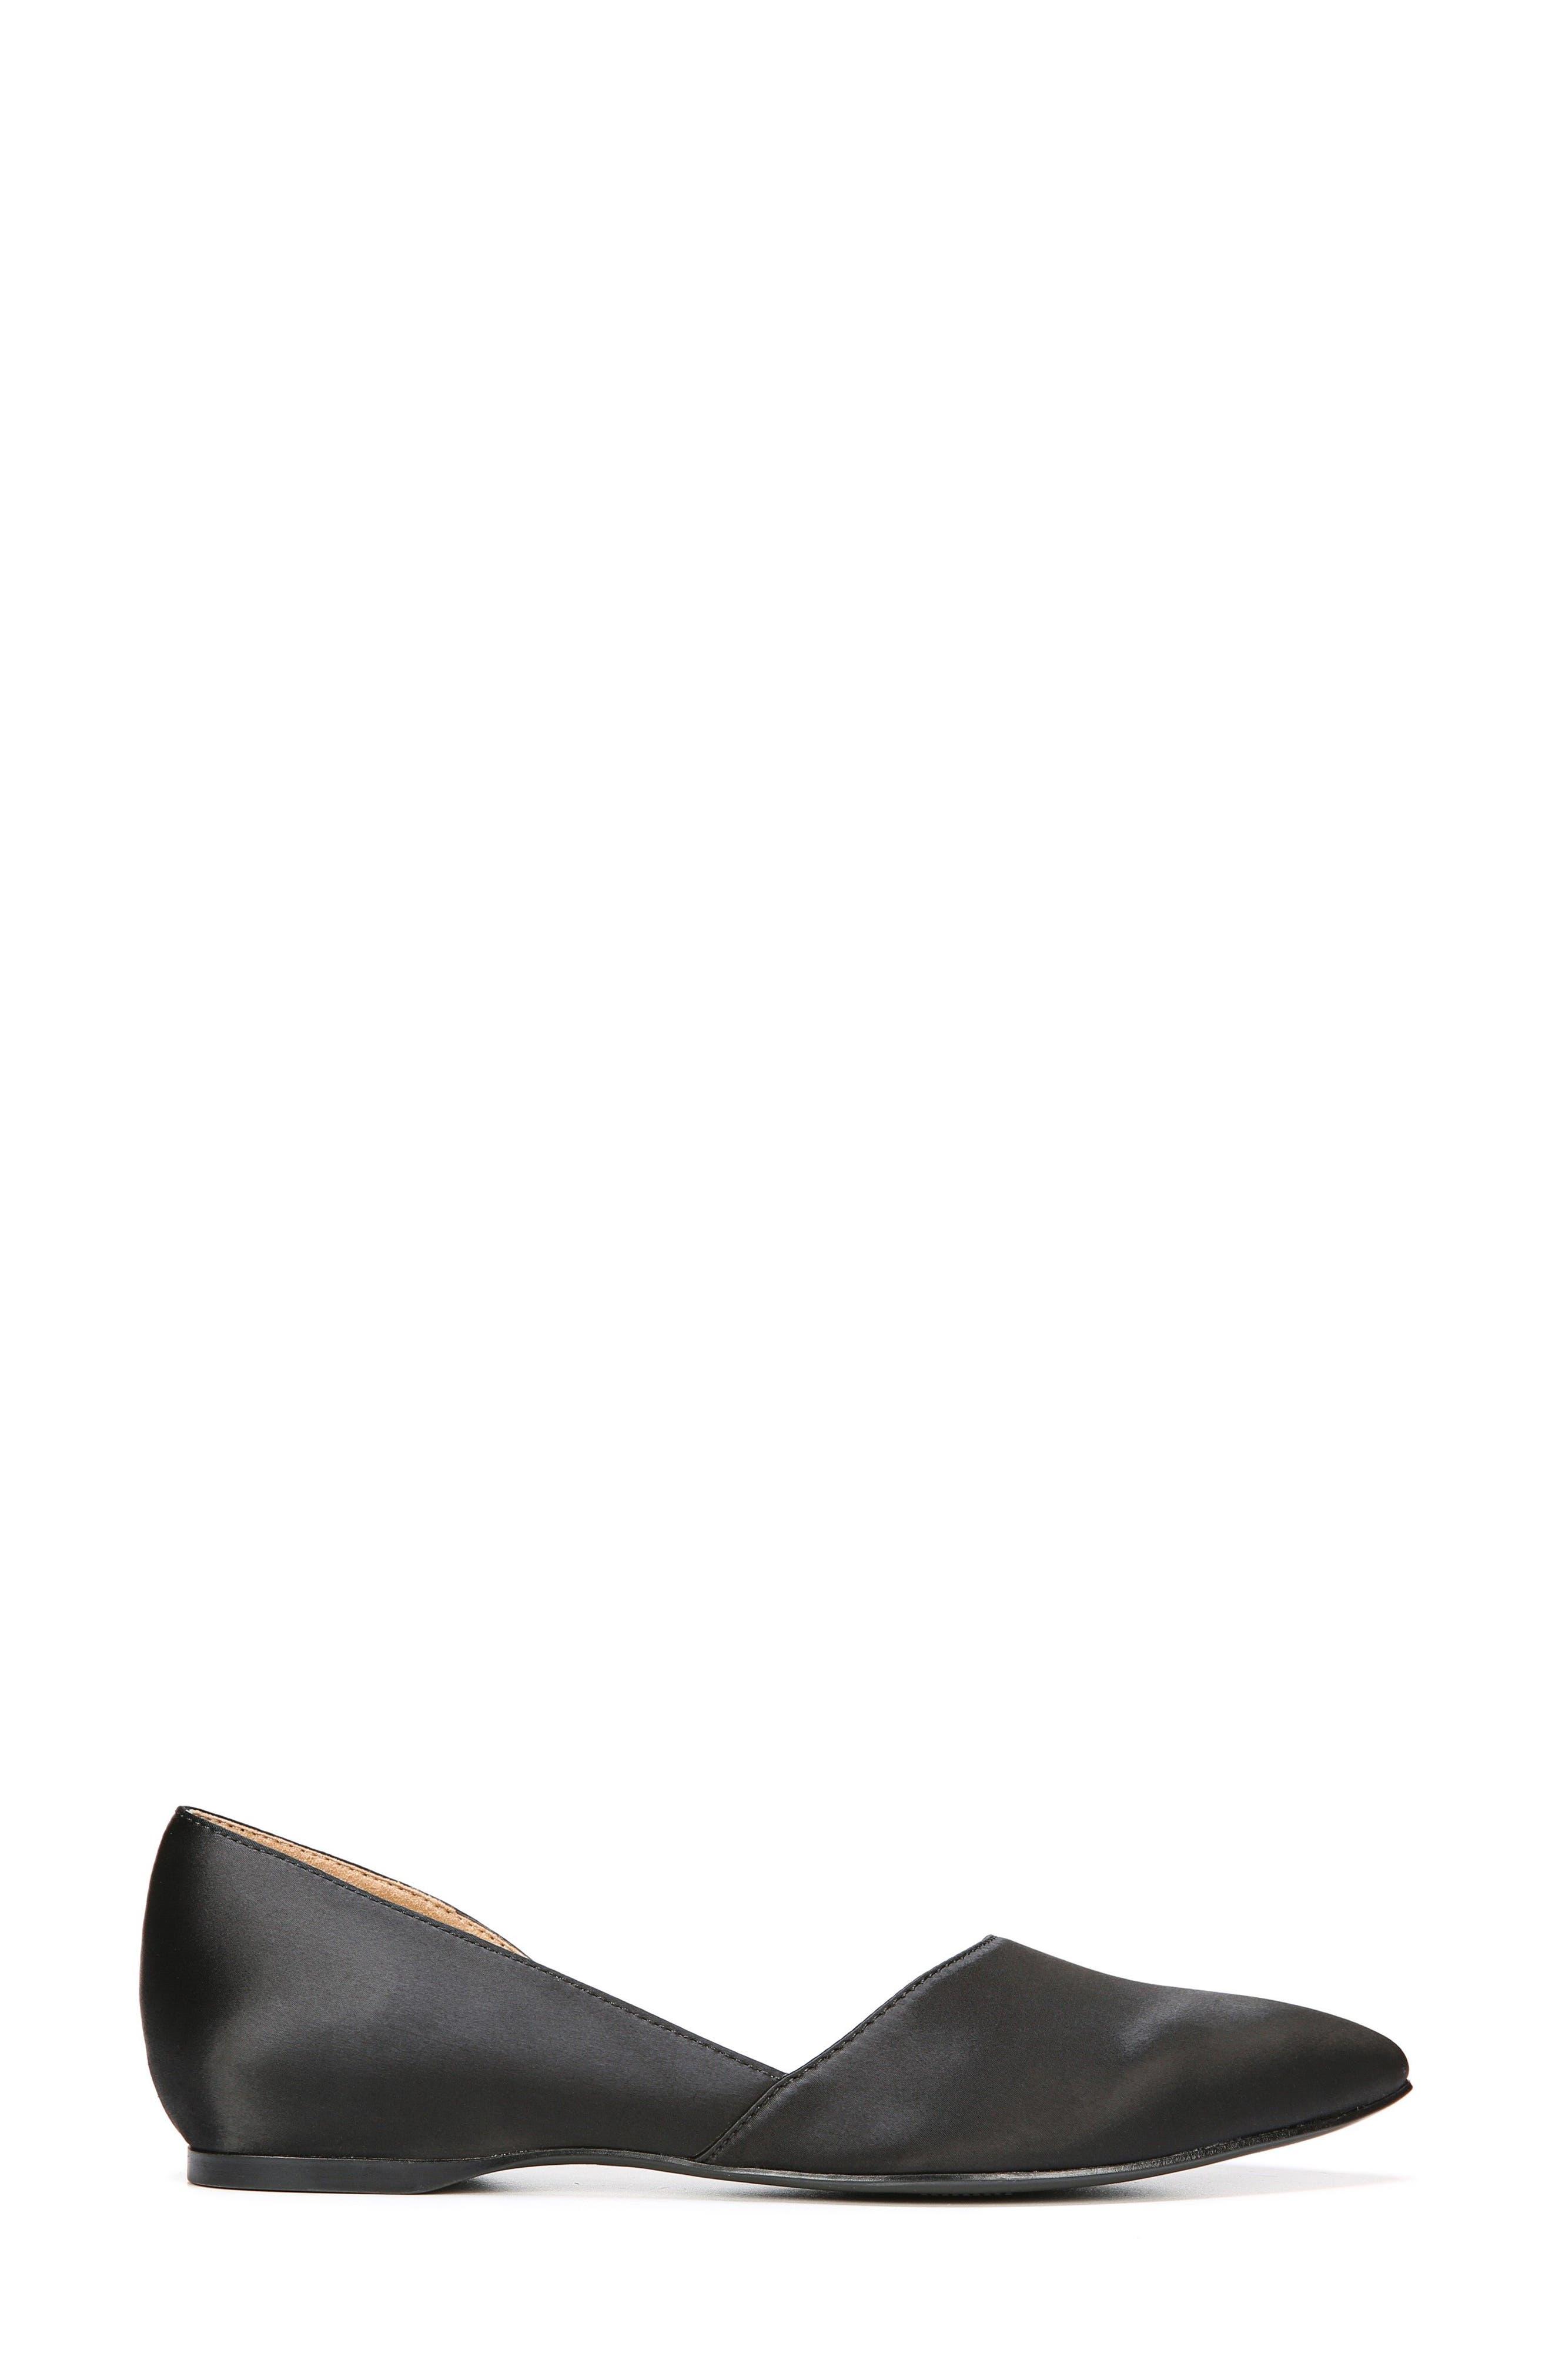 Samantha Half d'Orsay Flat,                             Alternate thumbnail 3, color,                             BLACK SATIN FABRIC